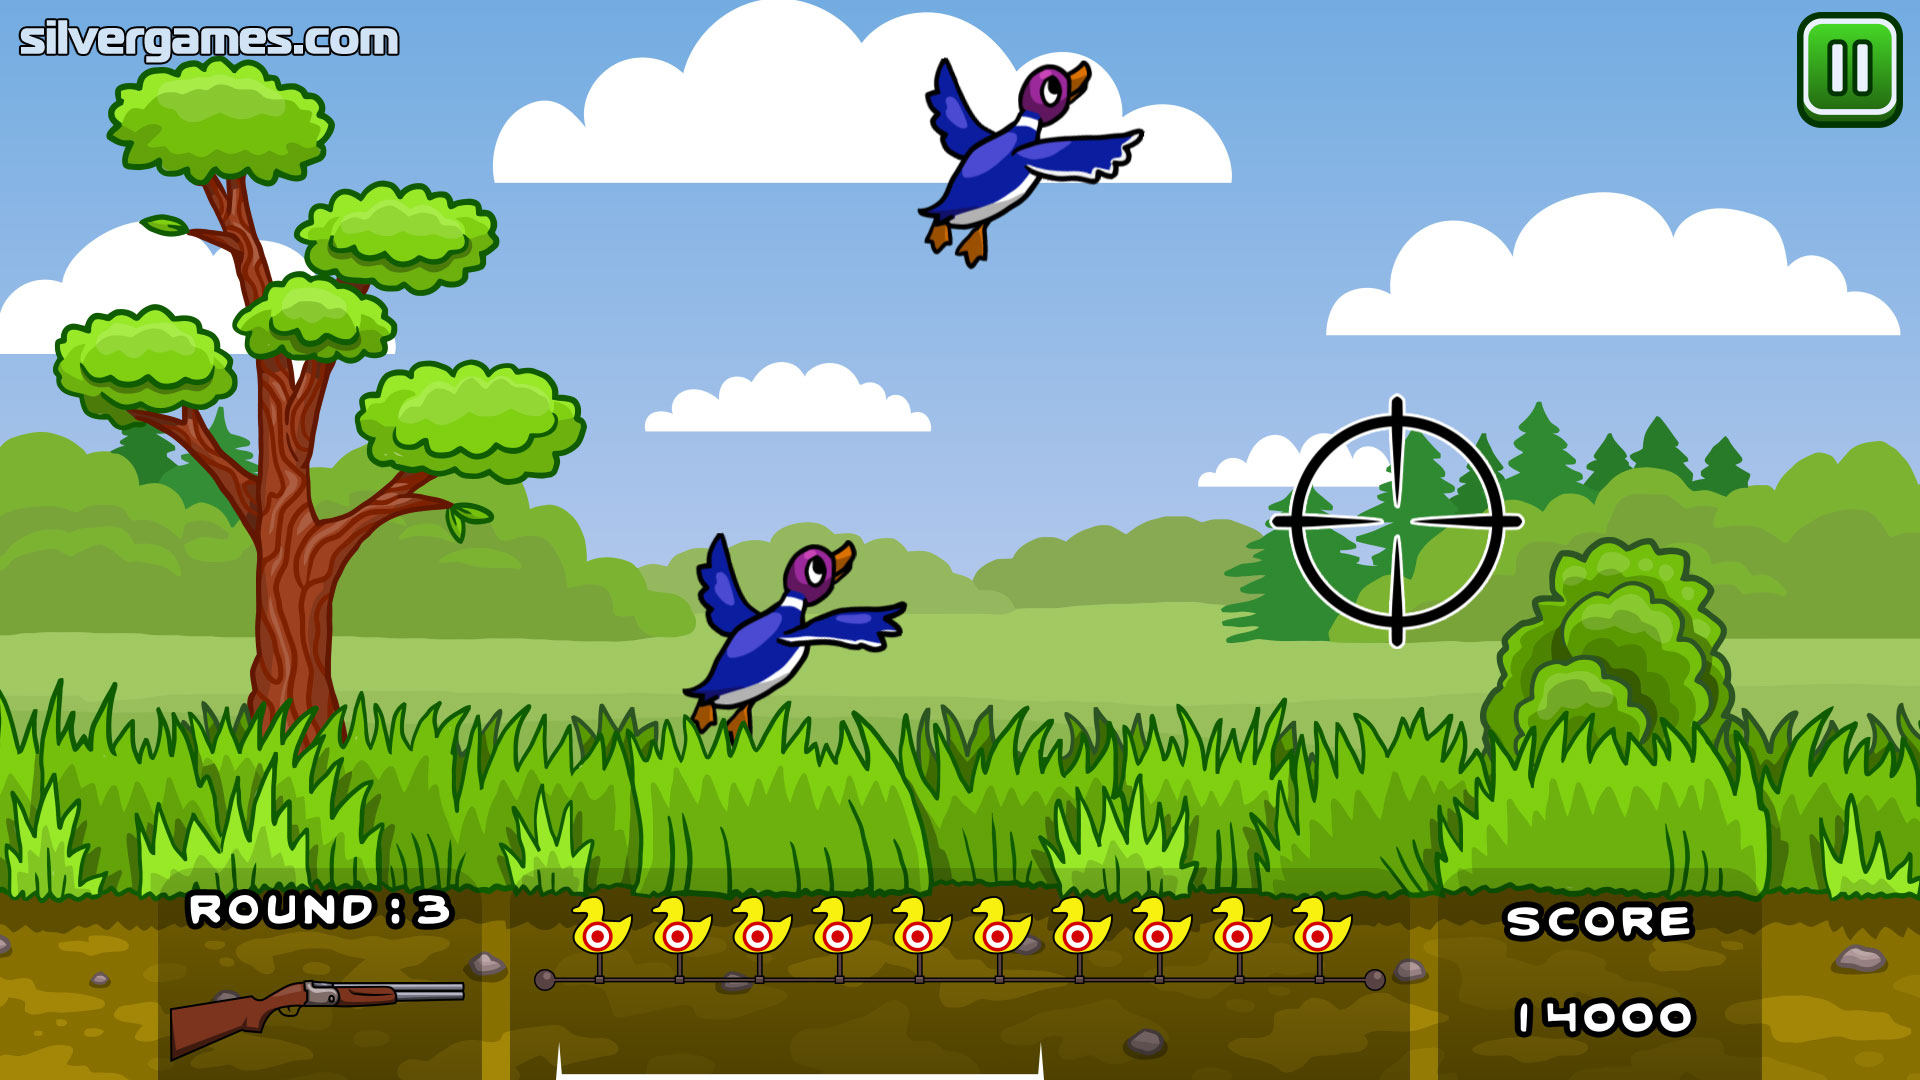 duck hunt 2 game online free